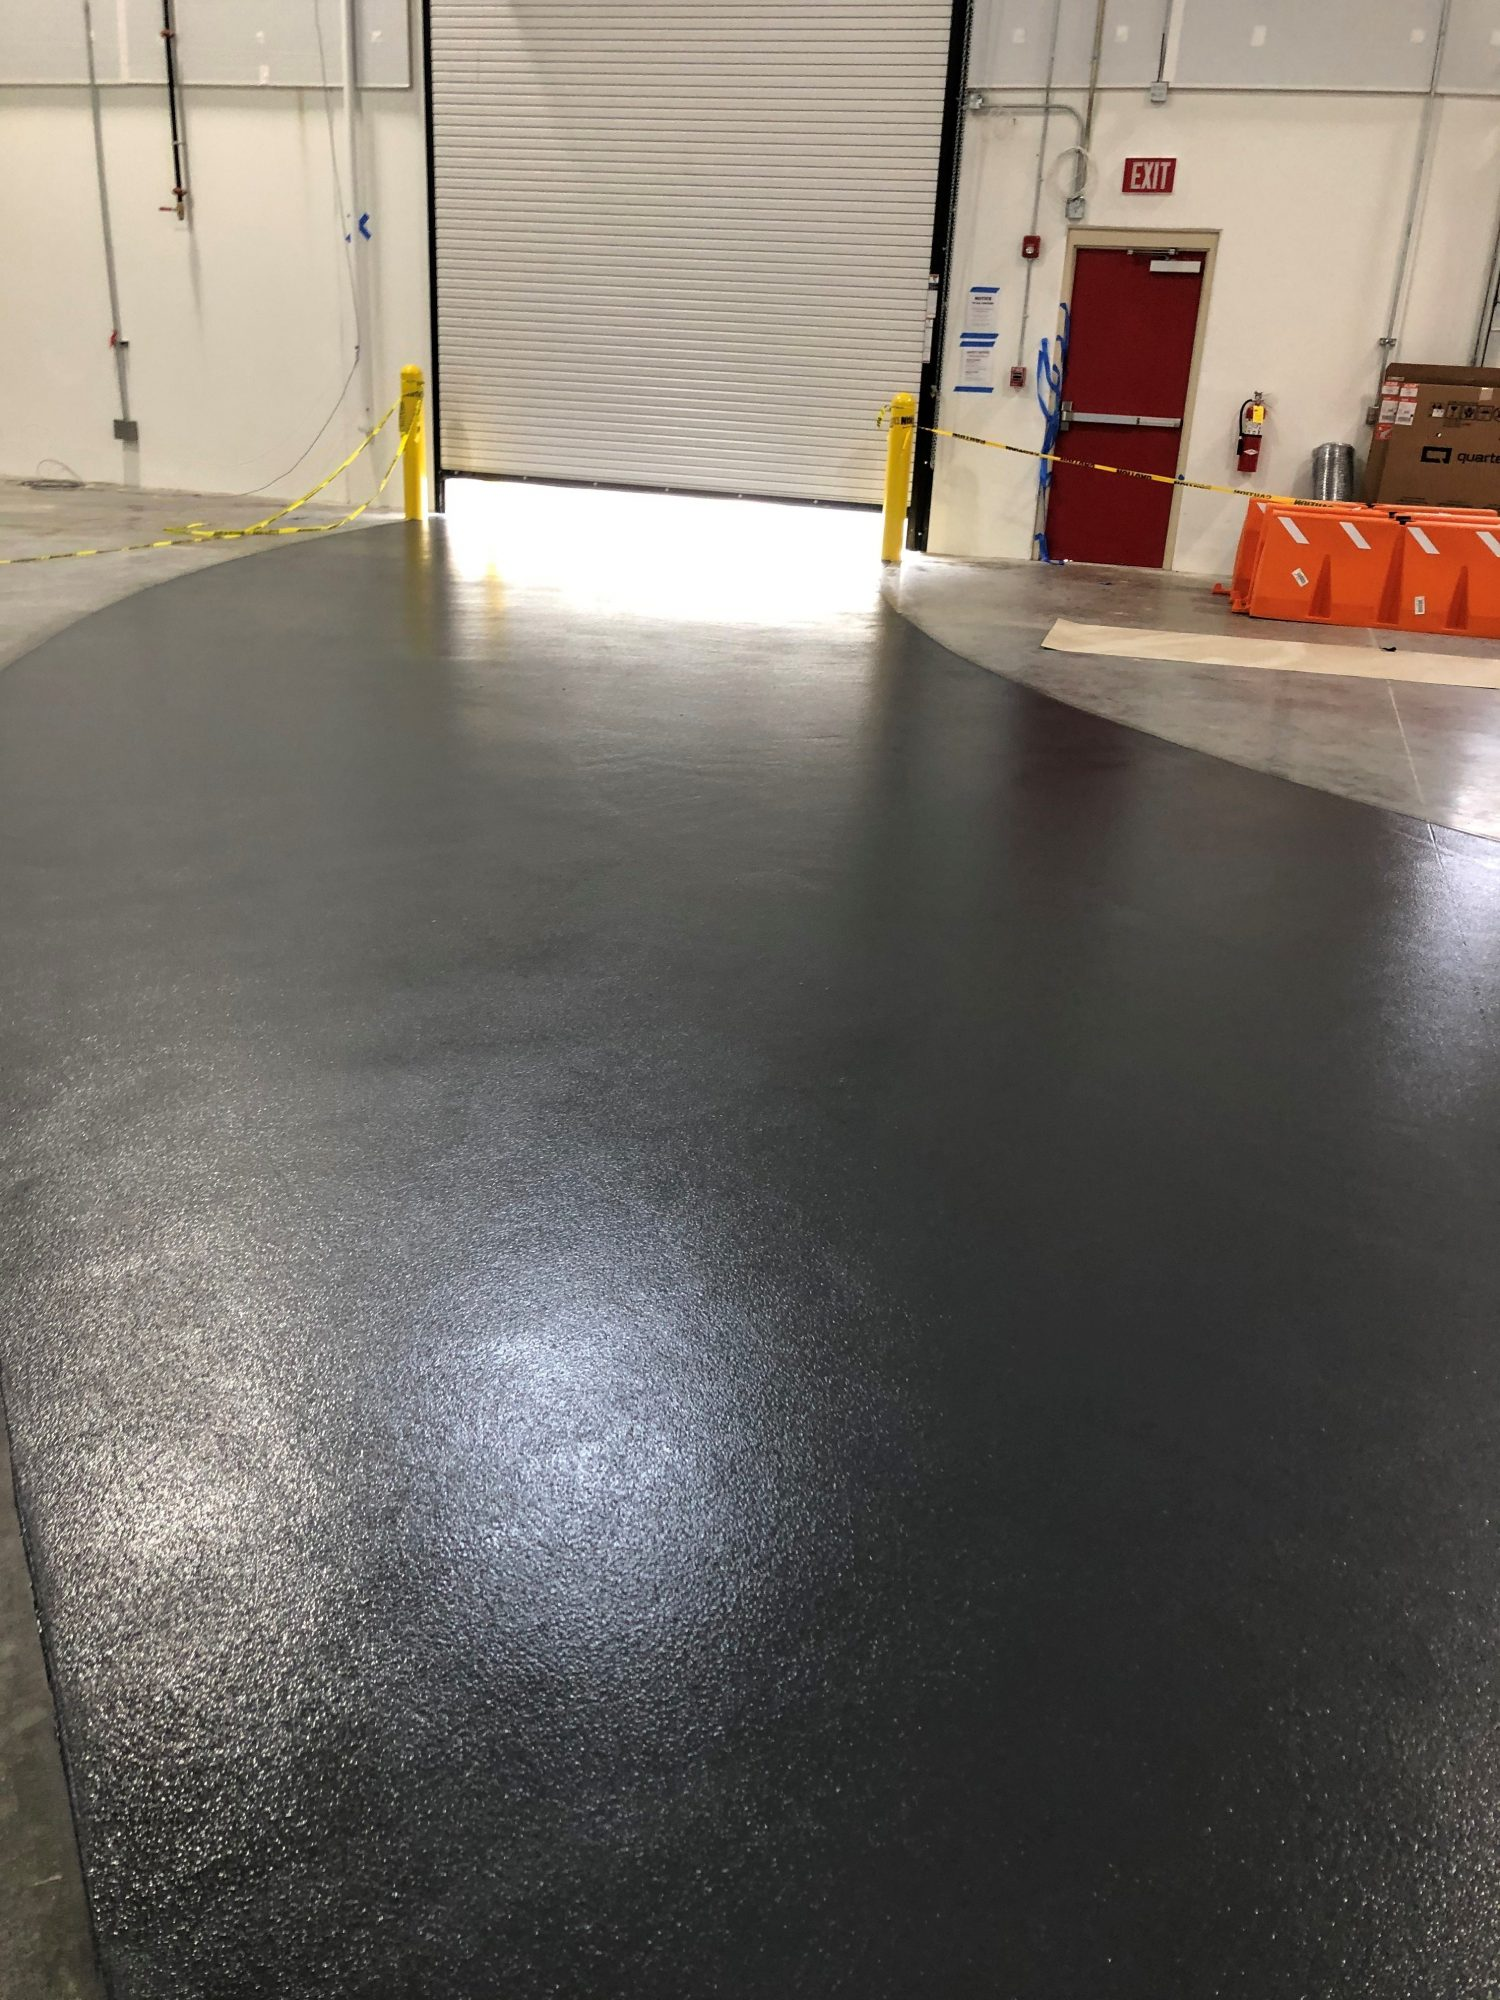 DurAFlexFloors, concrete floor coatings, epoxy floor coating, urethane mortar, Industrial Applications Inc, IA30yrs, traffic coating